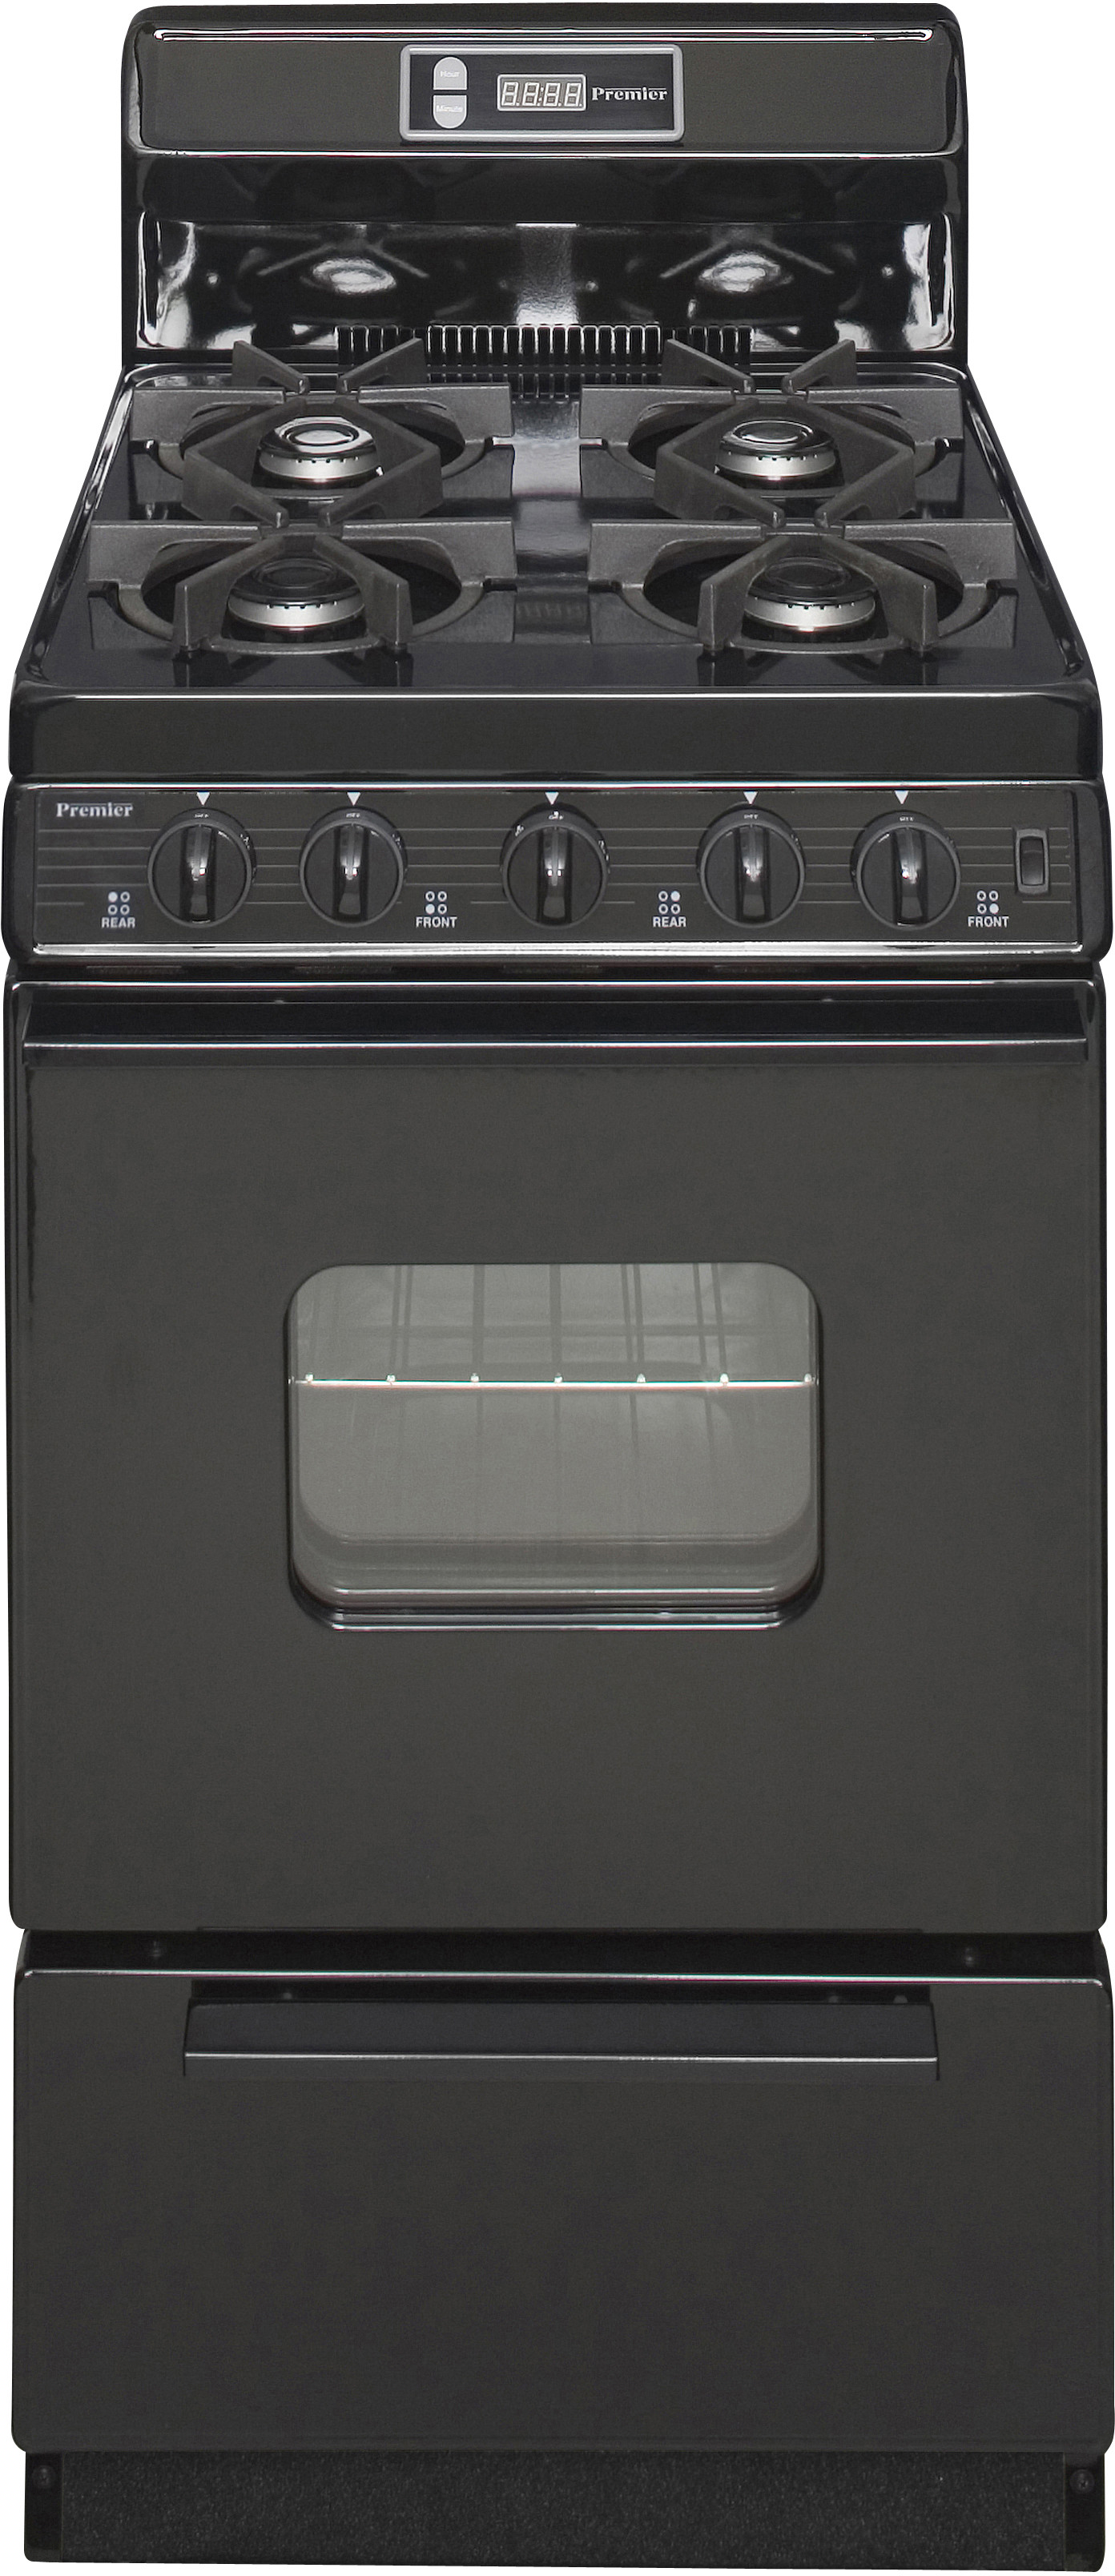 Premier Sak220xp 20 Inch Freestanding Gas Range With 4